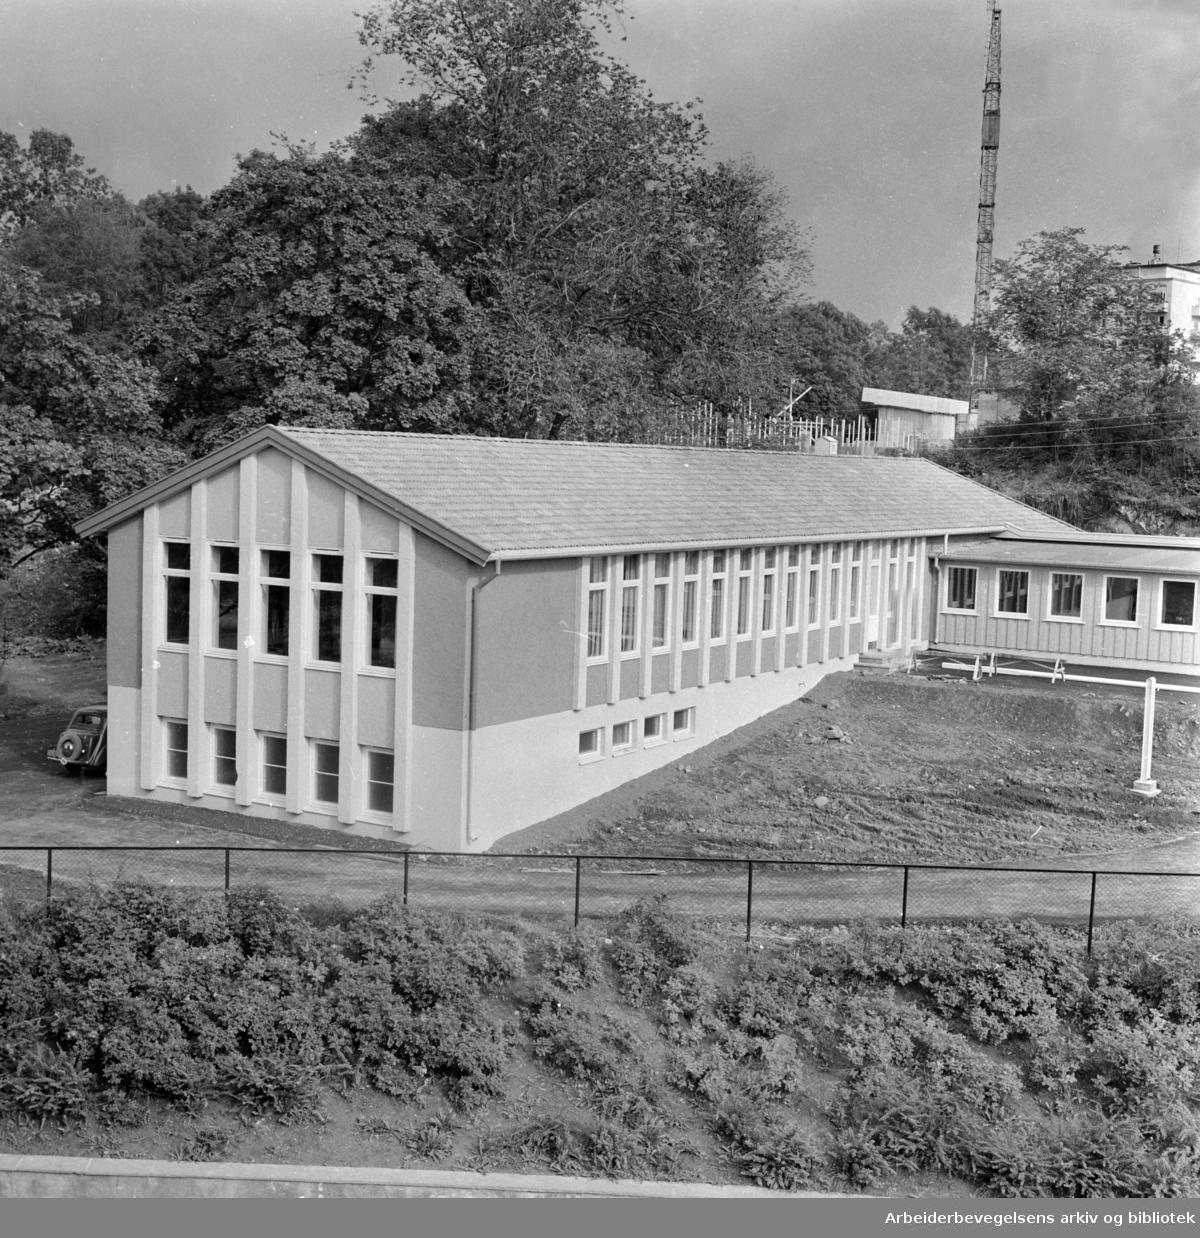 Marienlyst skolebygg for cerebral parese-barn August 1958